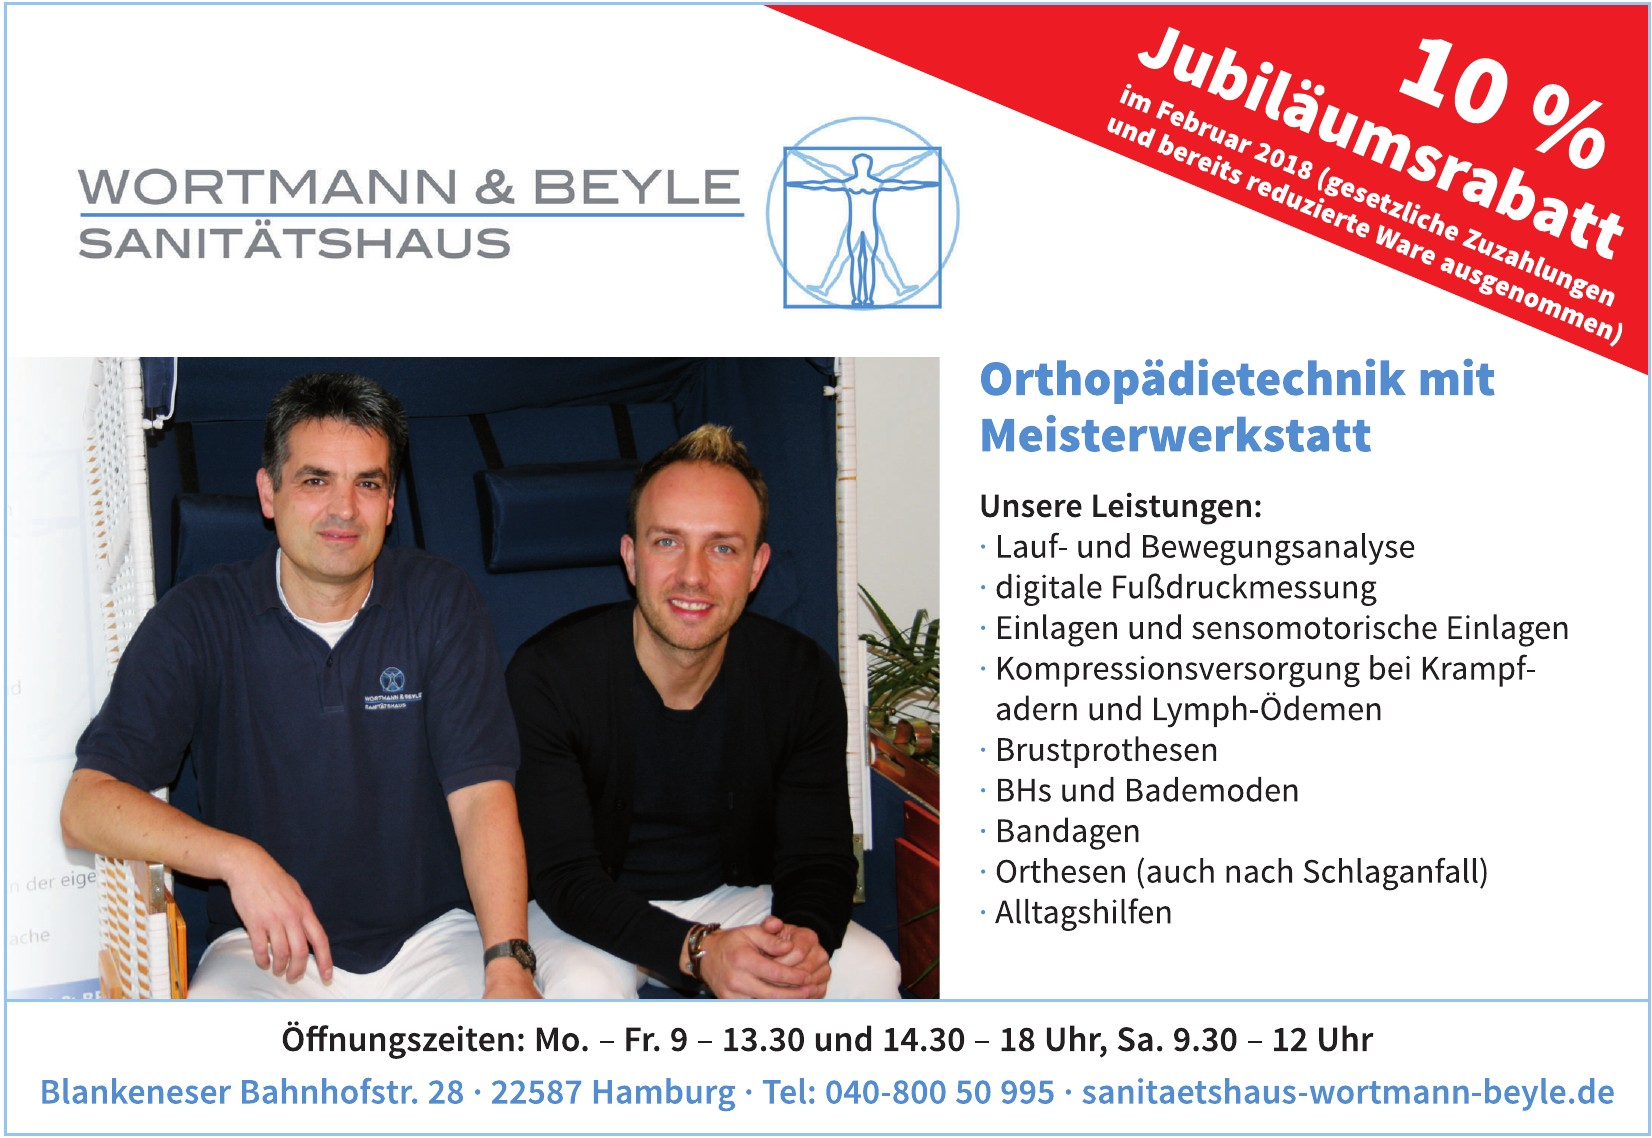 Wortmann & Beyle Sanitätshaus GbR